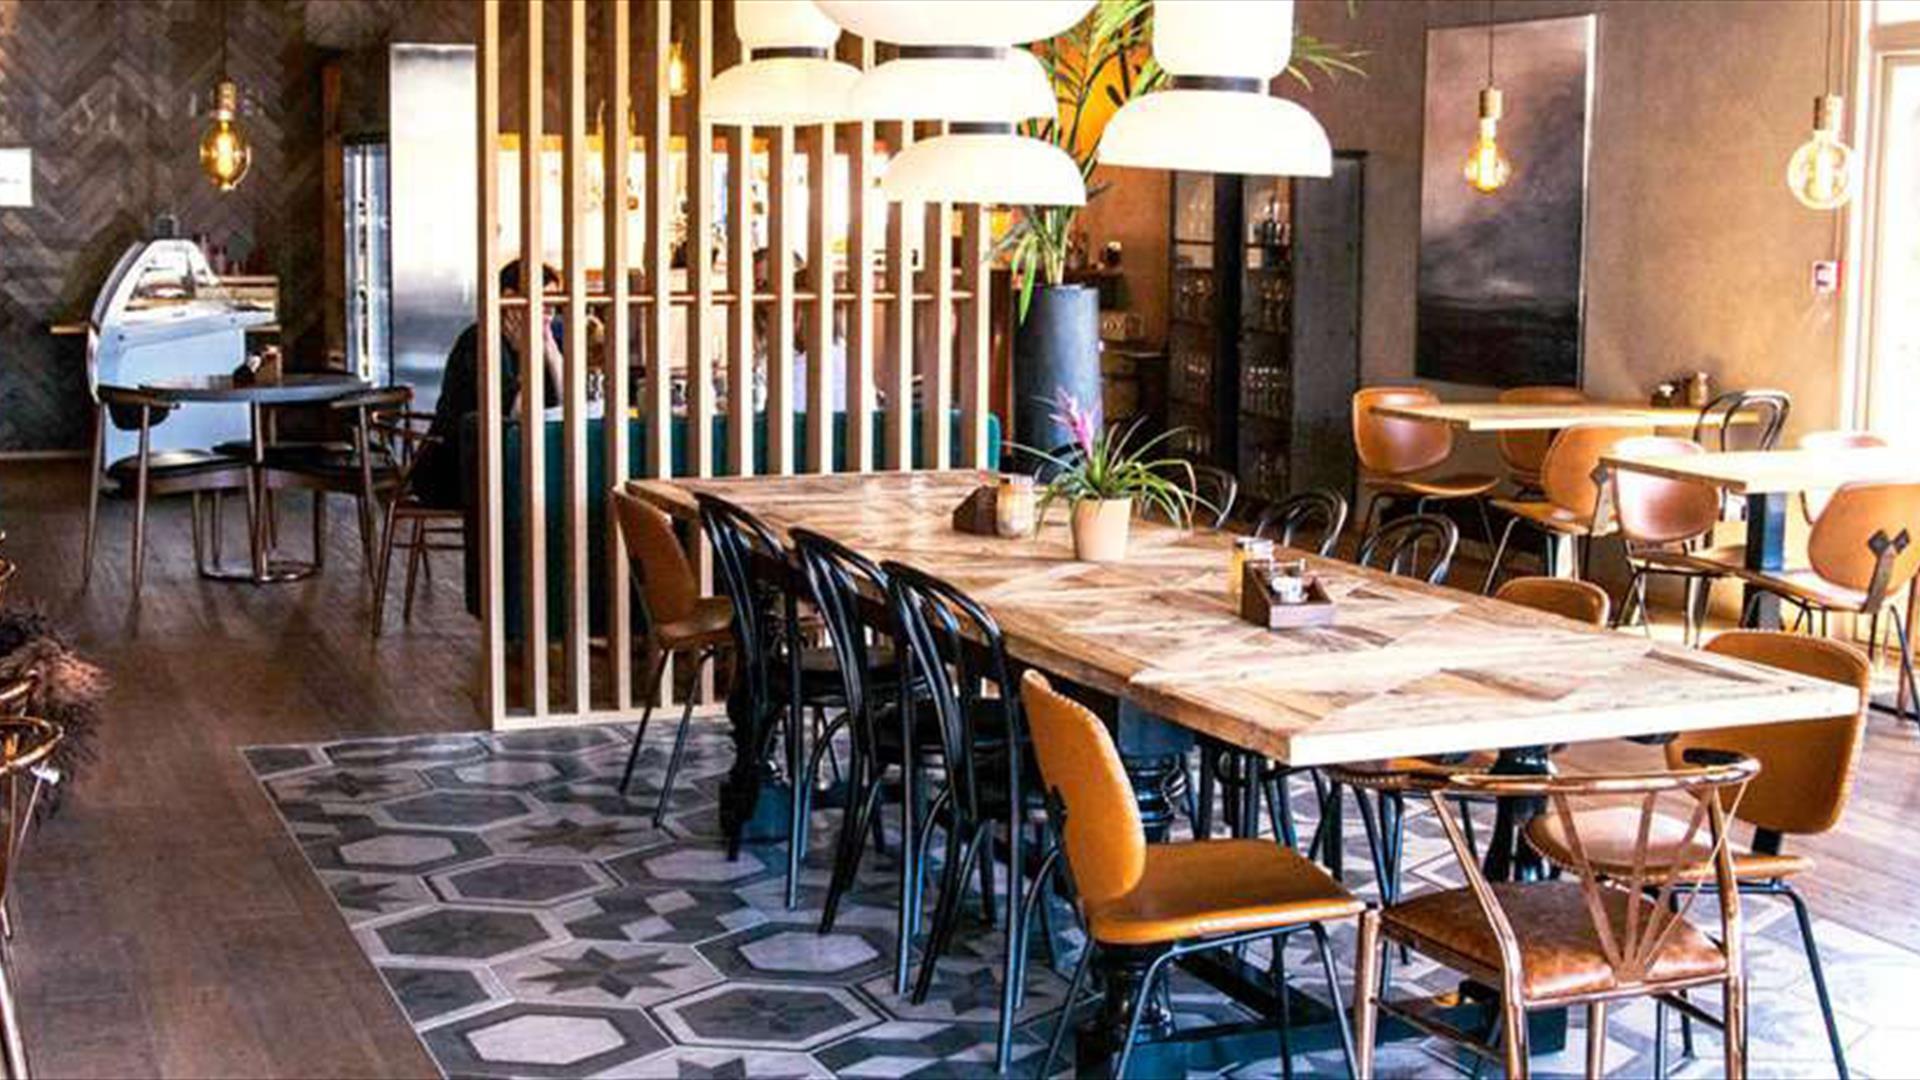 The restaurant - Annis